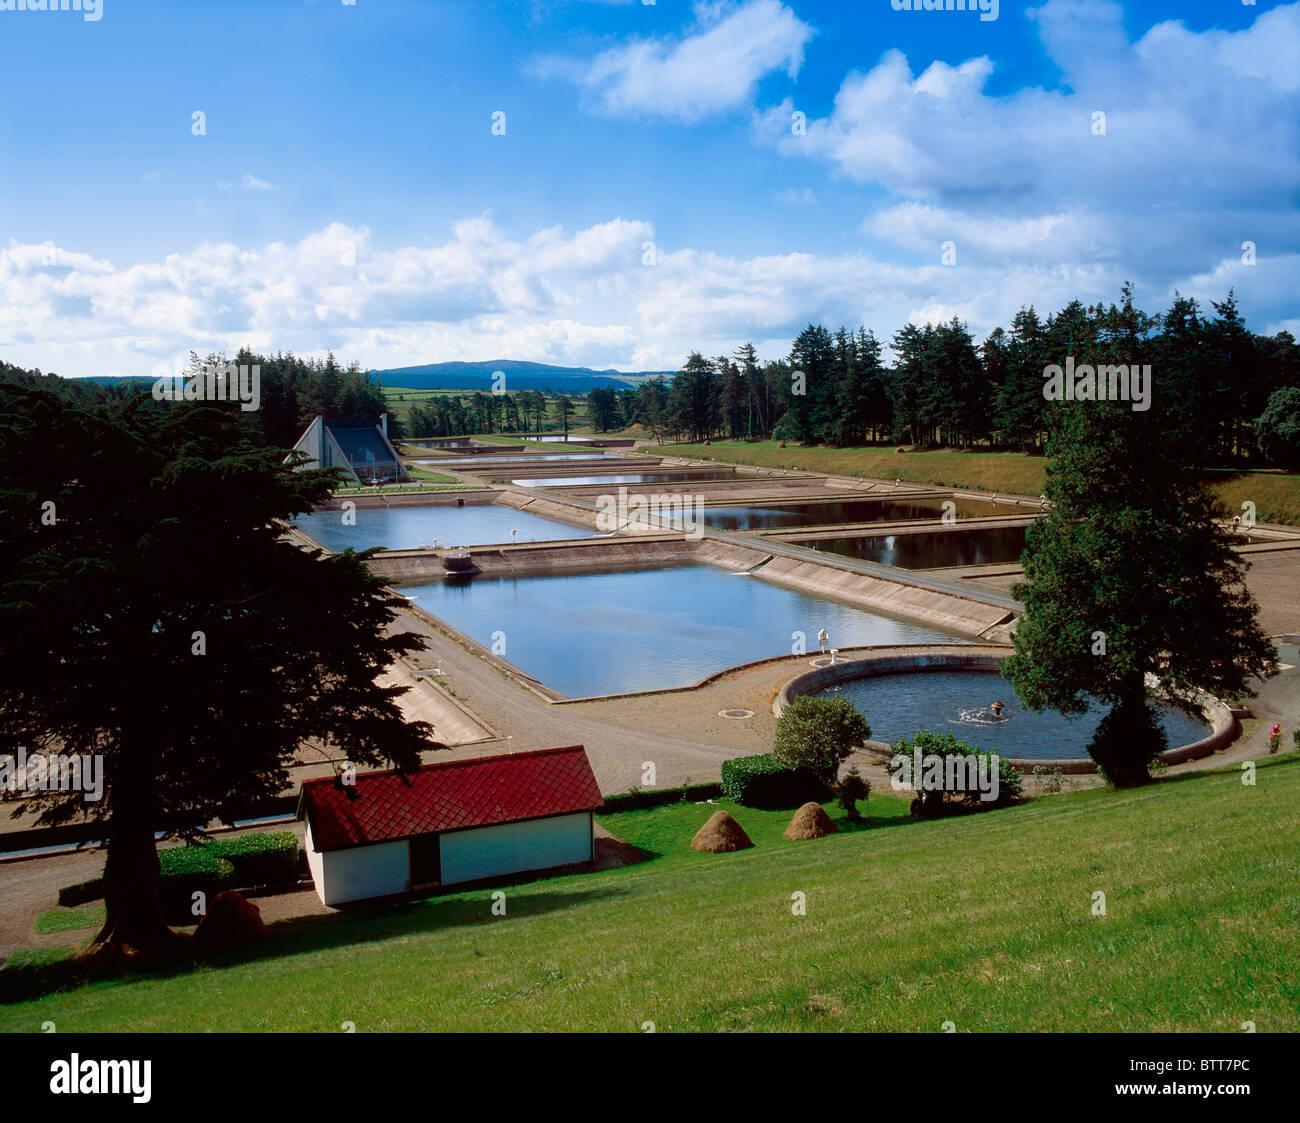 Fresh Water Filtration Beds, Vartry Reservoir, Co Wicklow, Ireland - Stock Image